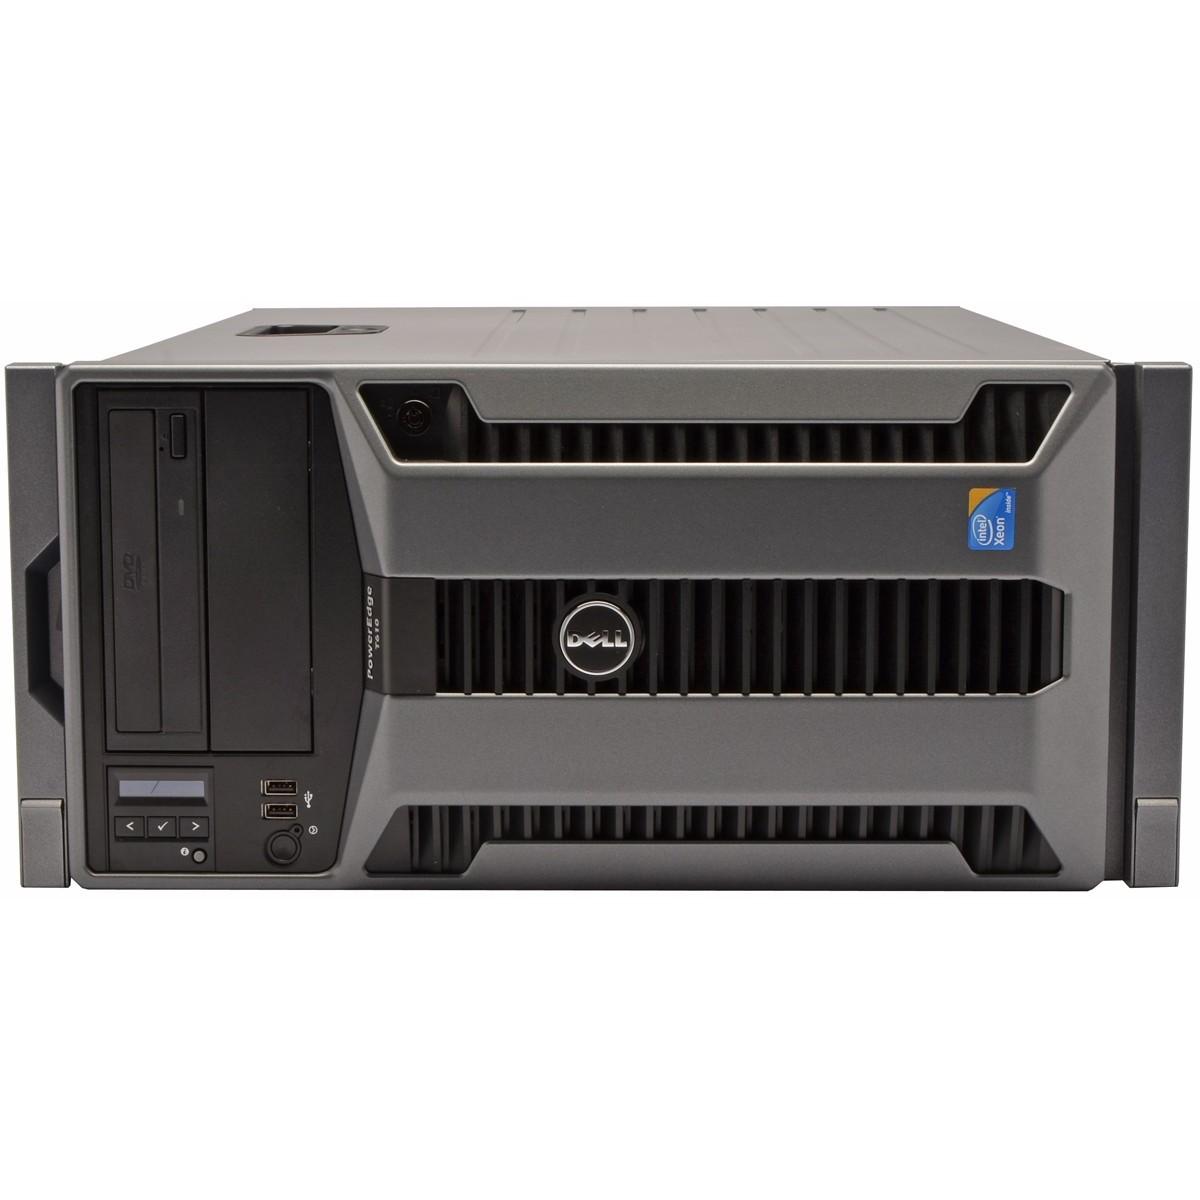 Szyny 374517-001 HP ML570 G3